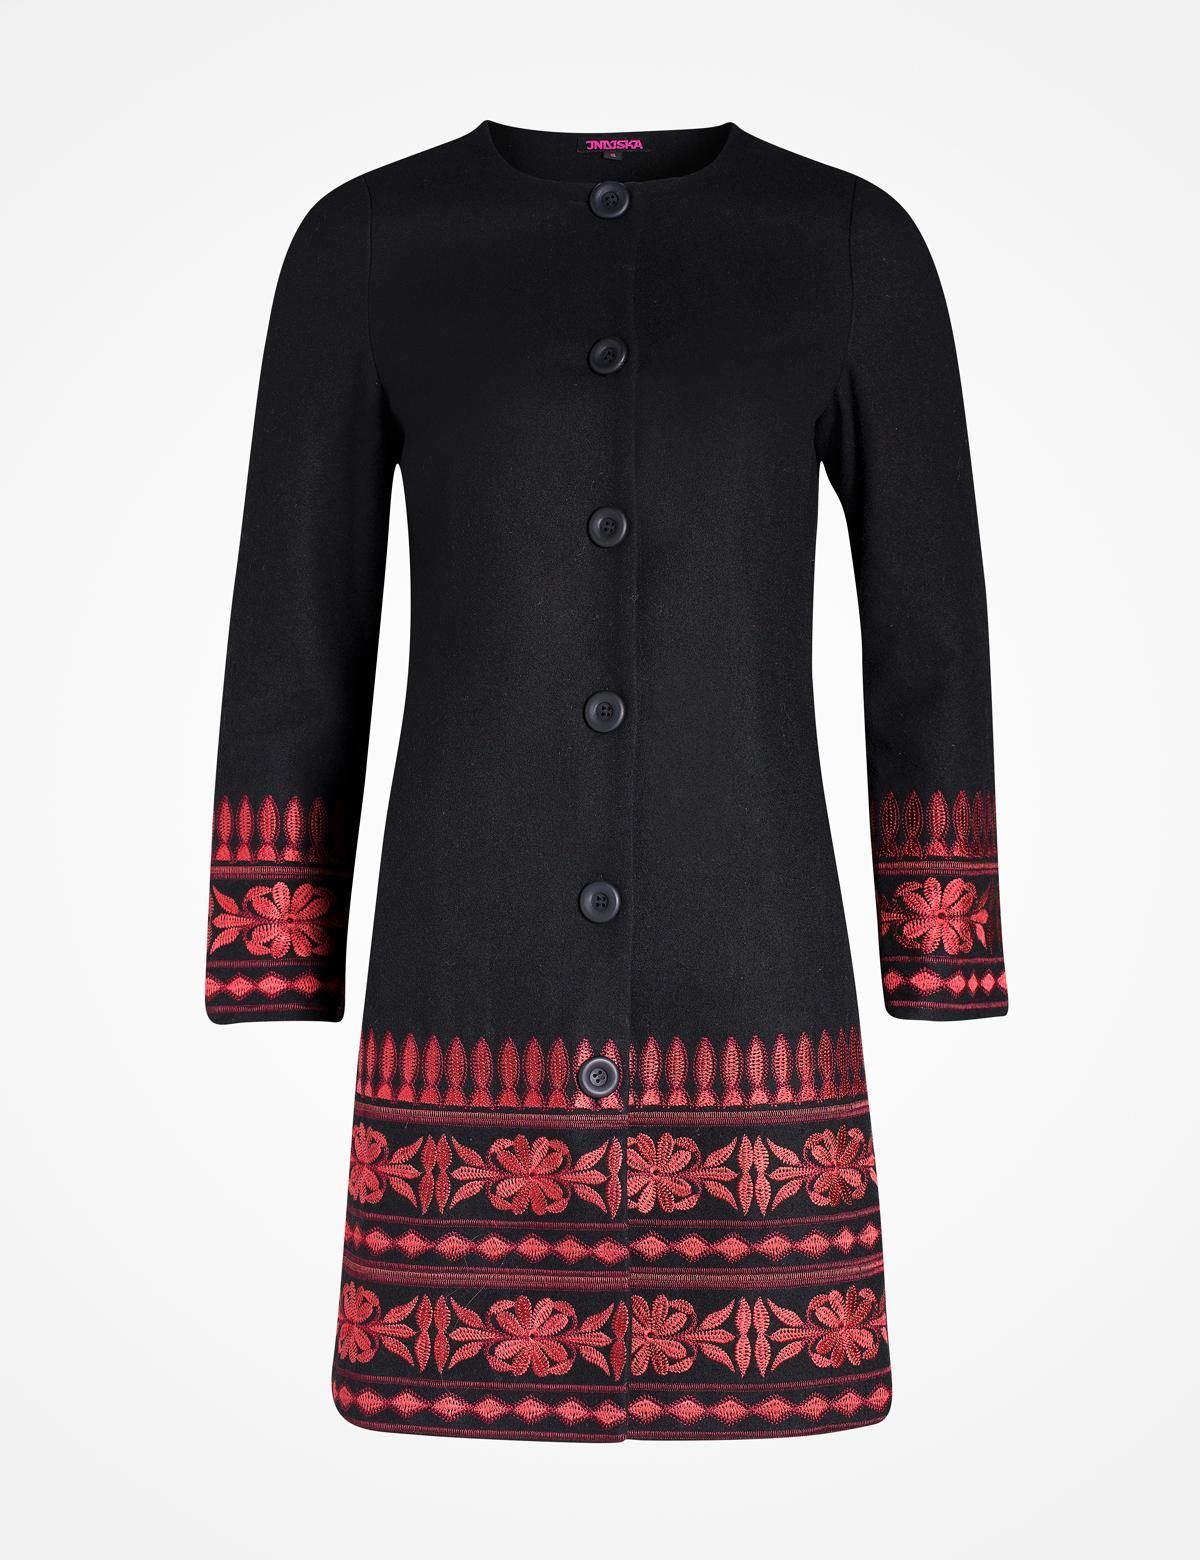 d024825a SORAYA jacka mörkröd | Jacket | Outerwear | Ytterplagg | Mode | INDISKA  Shop Online